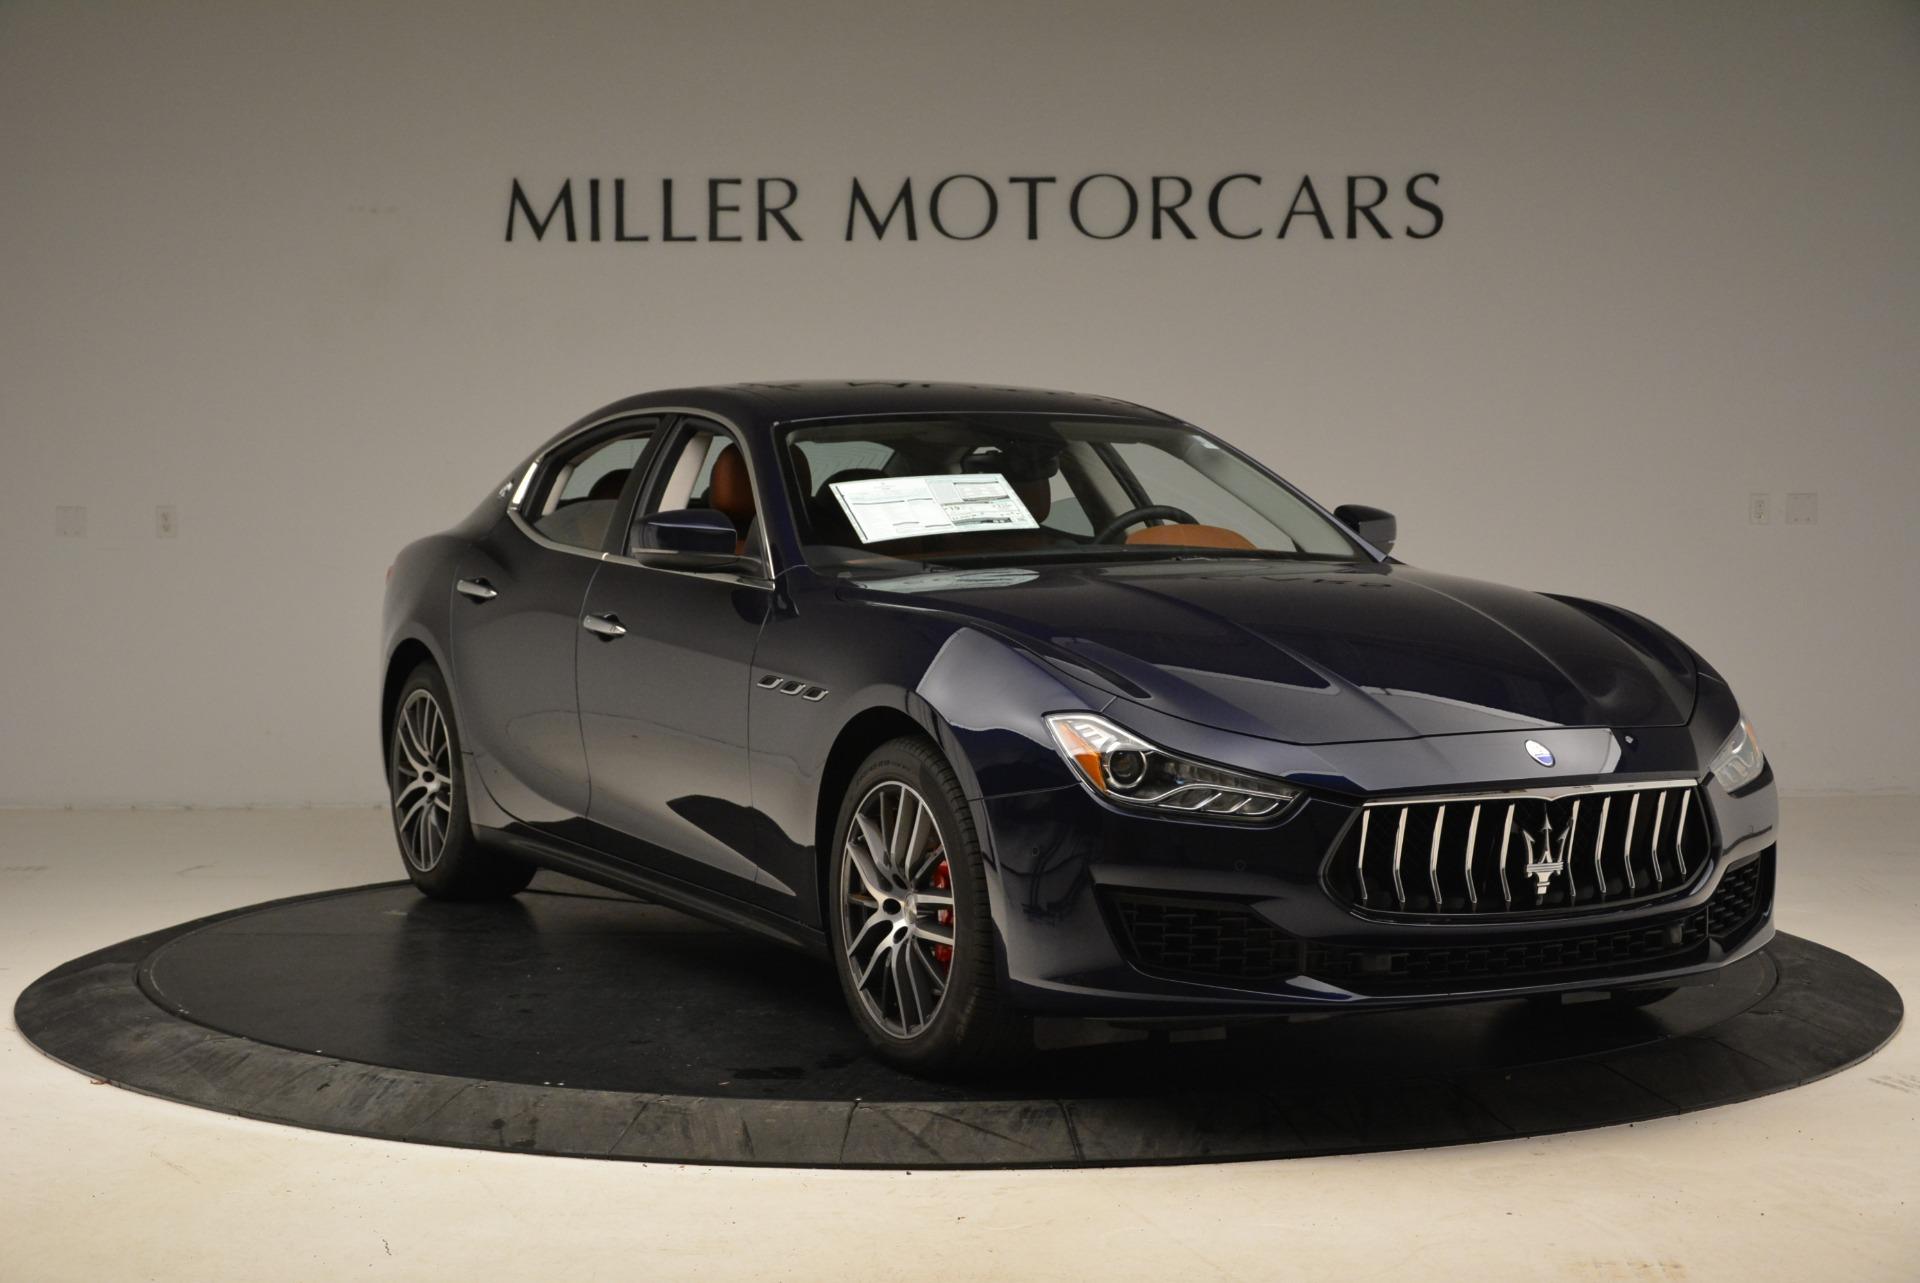 New 2019 Maserati Ghibli S Q4 For Sale In Westport, CT 2799_p11